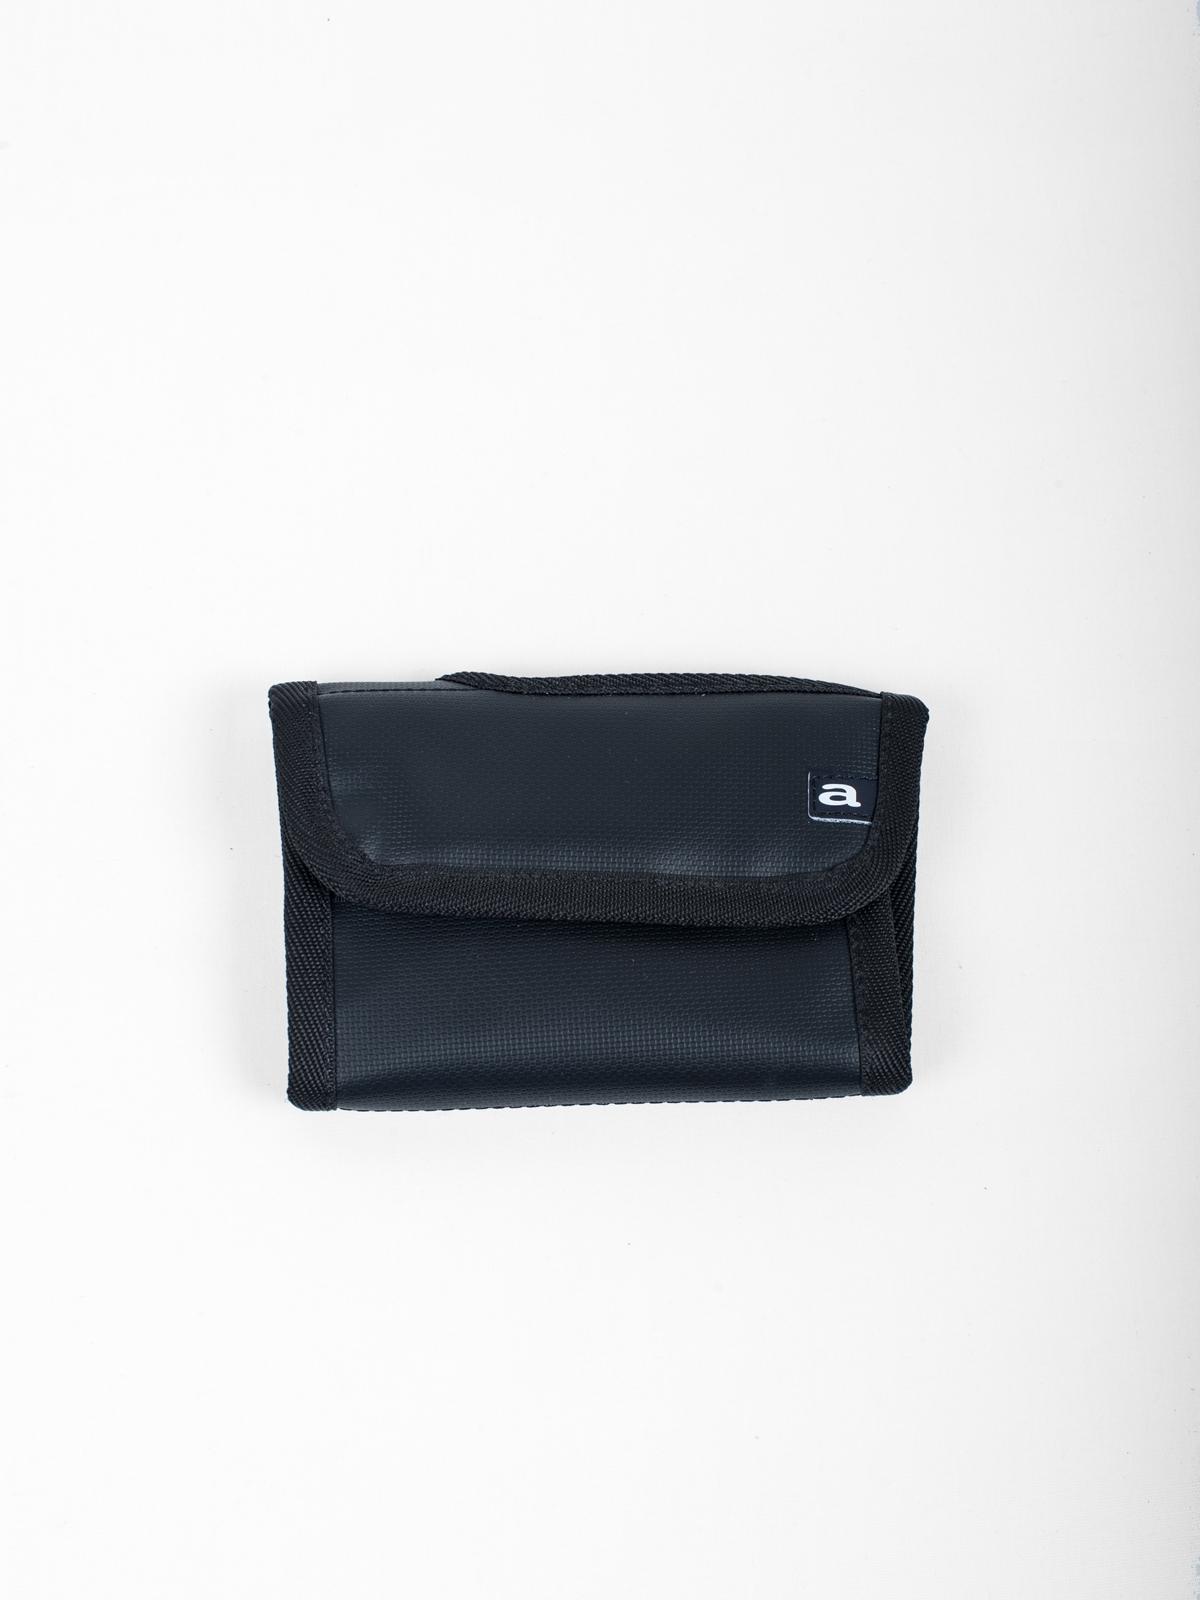 airbag craftworks 325